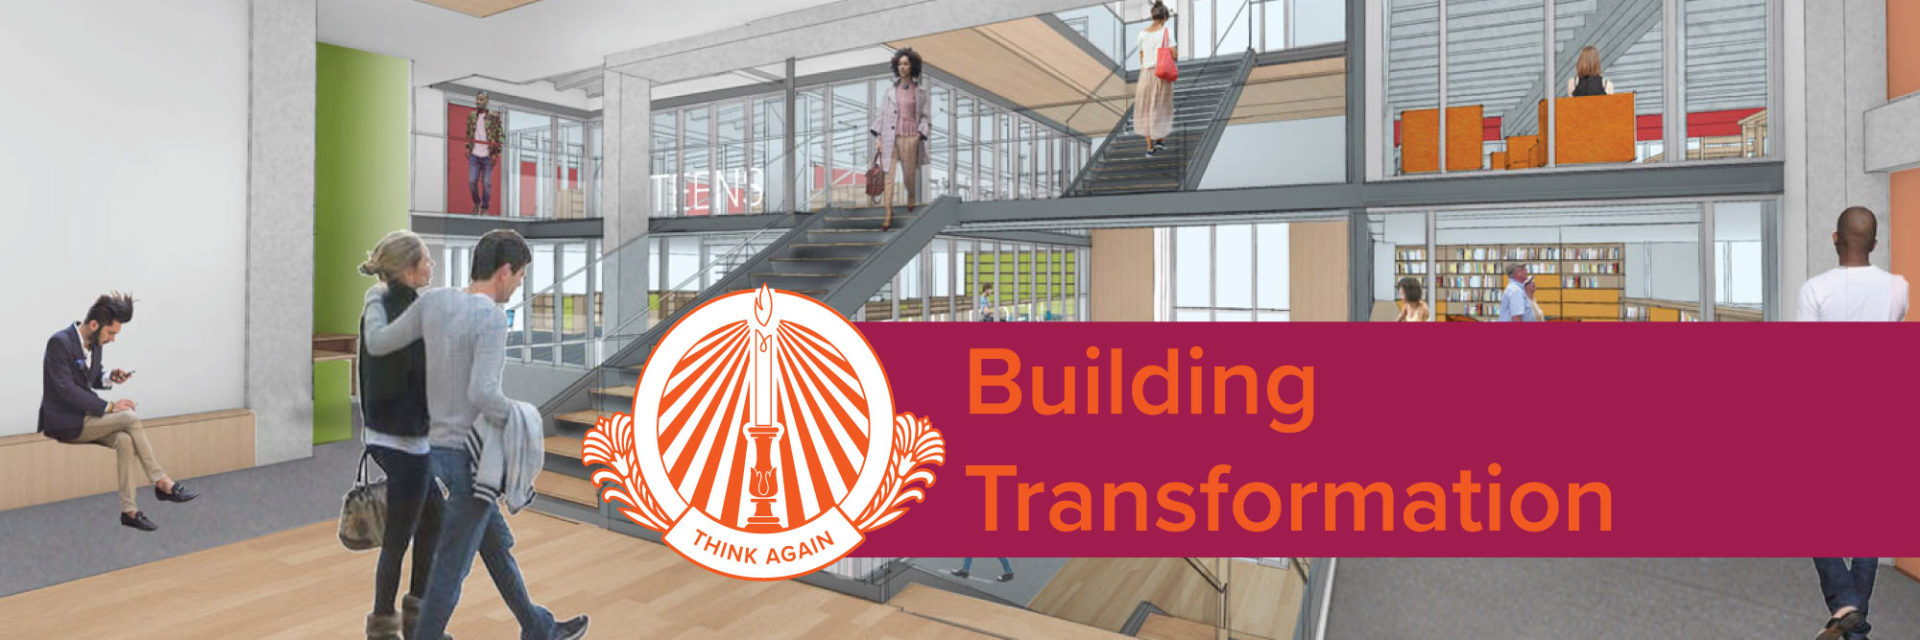 THINK AGAIN | Building Transformation